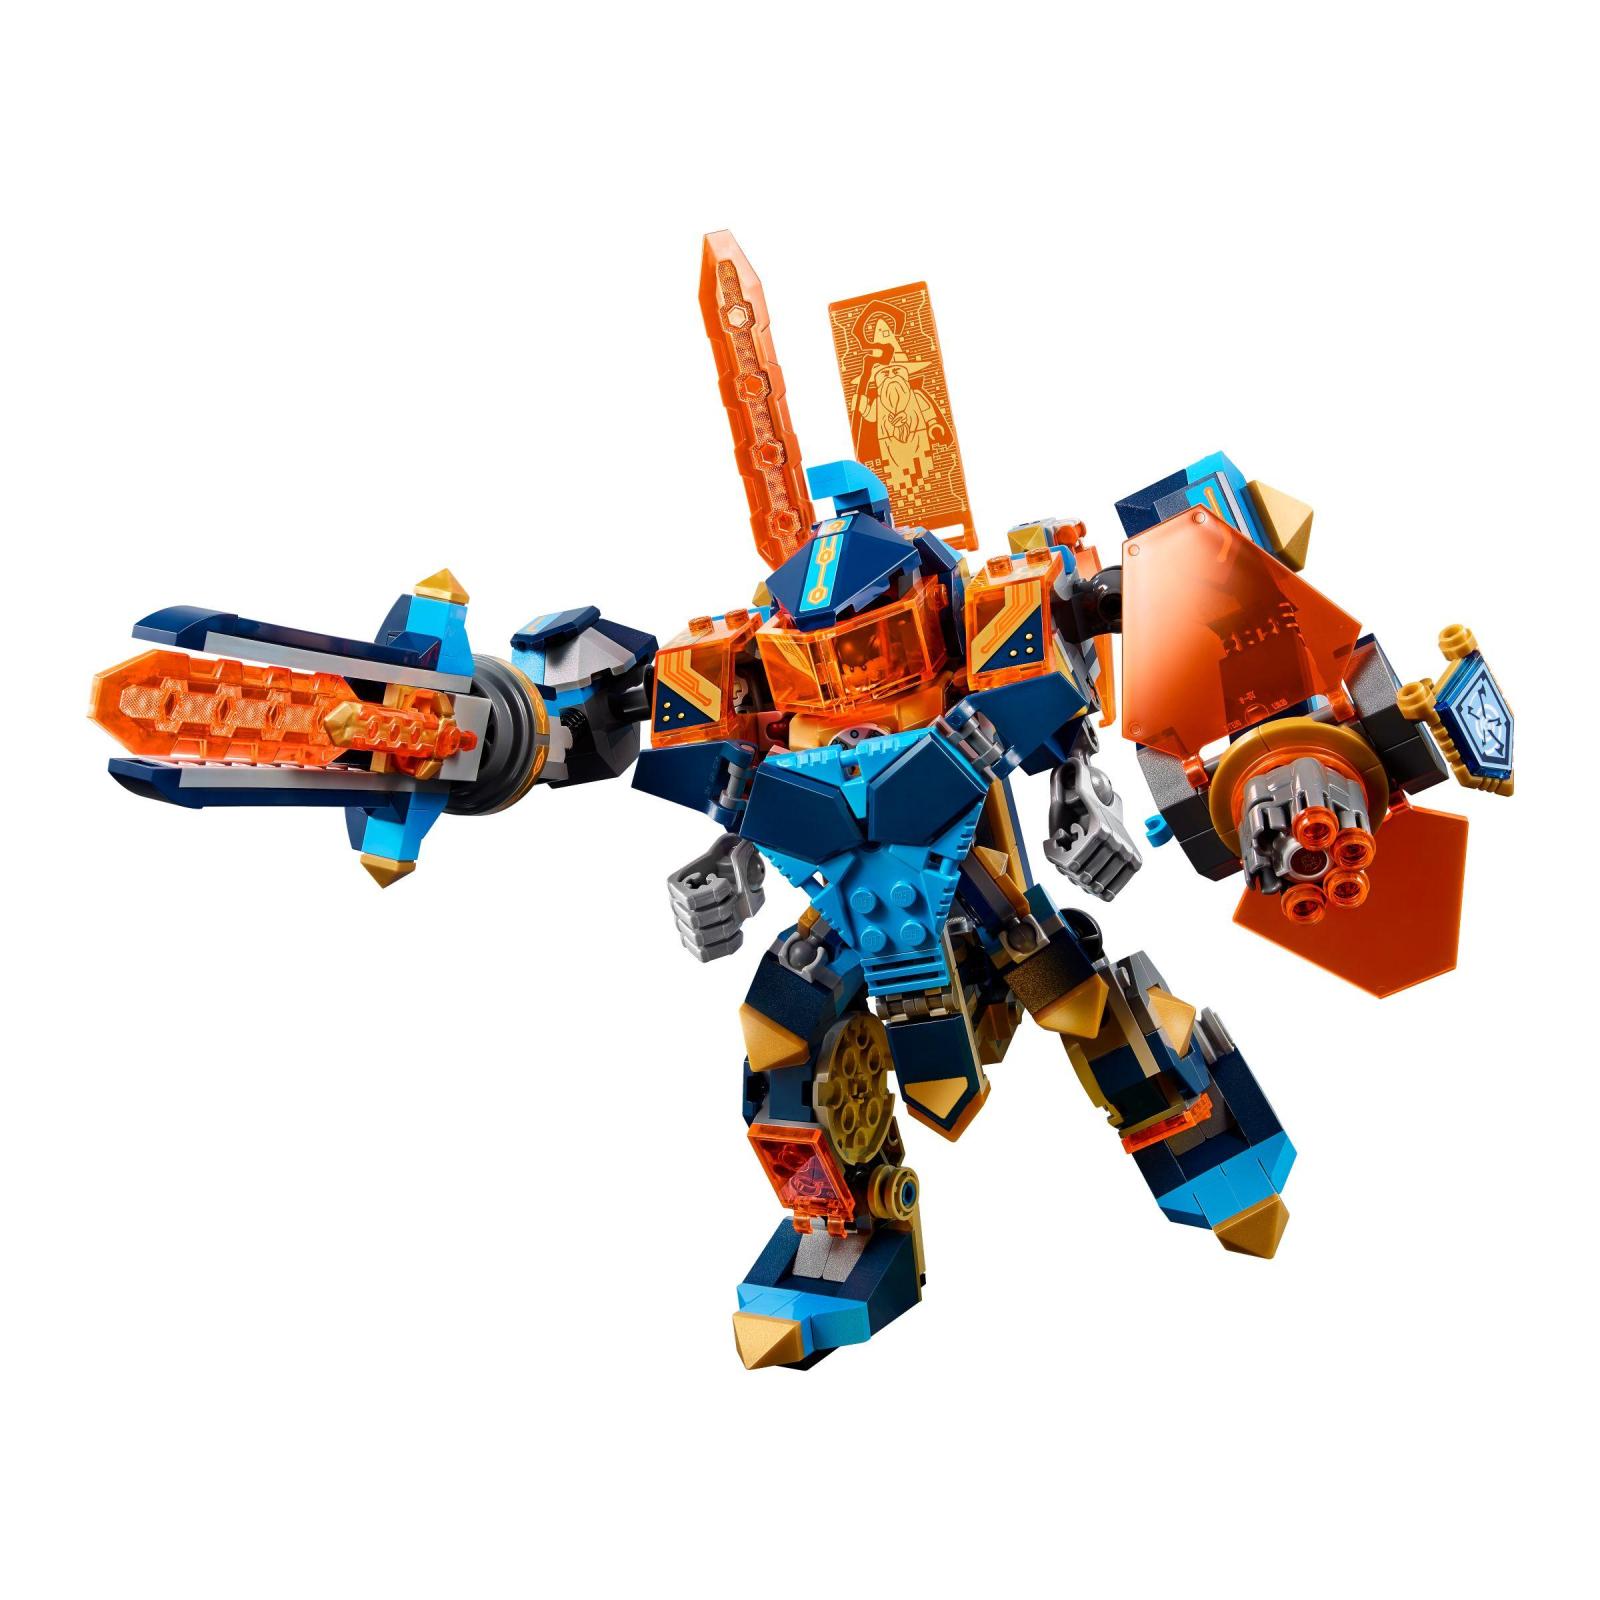 Конструктор LEGO Nexo Knights Бой техномагов (72004) изображение 3